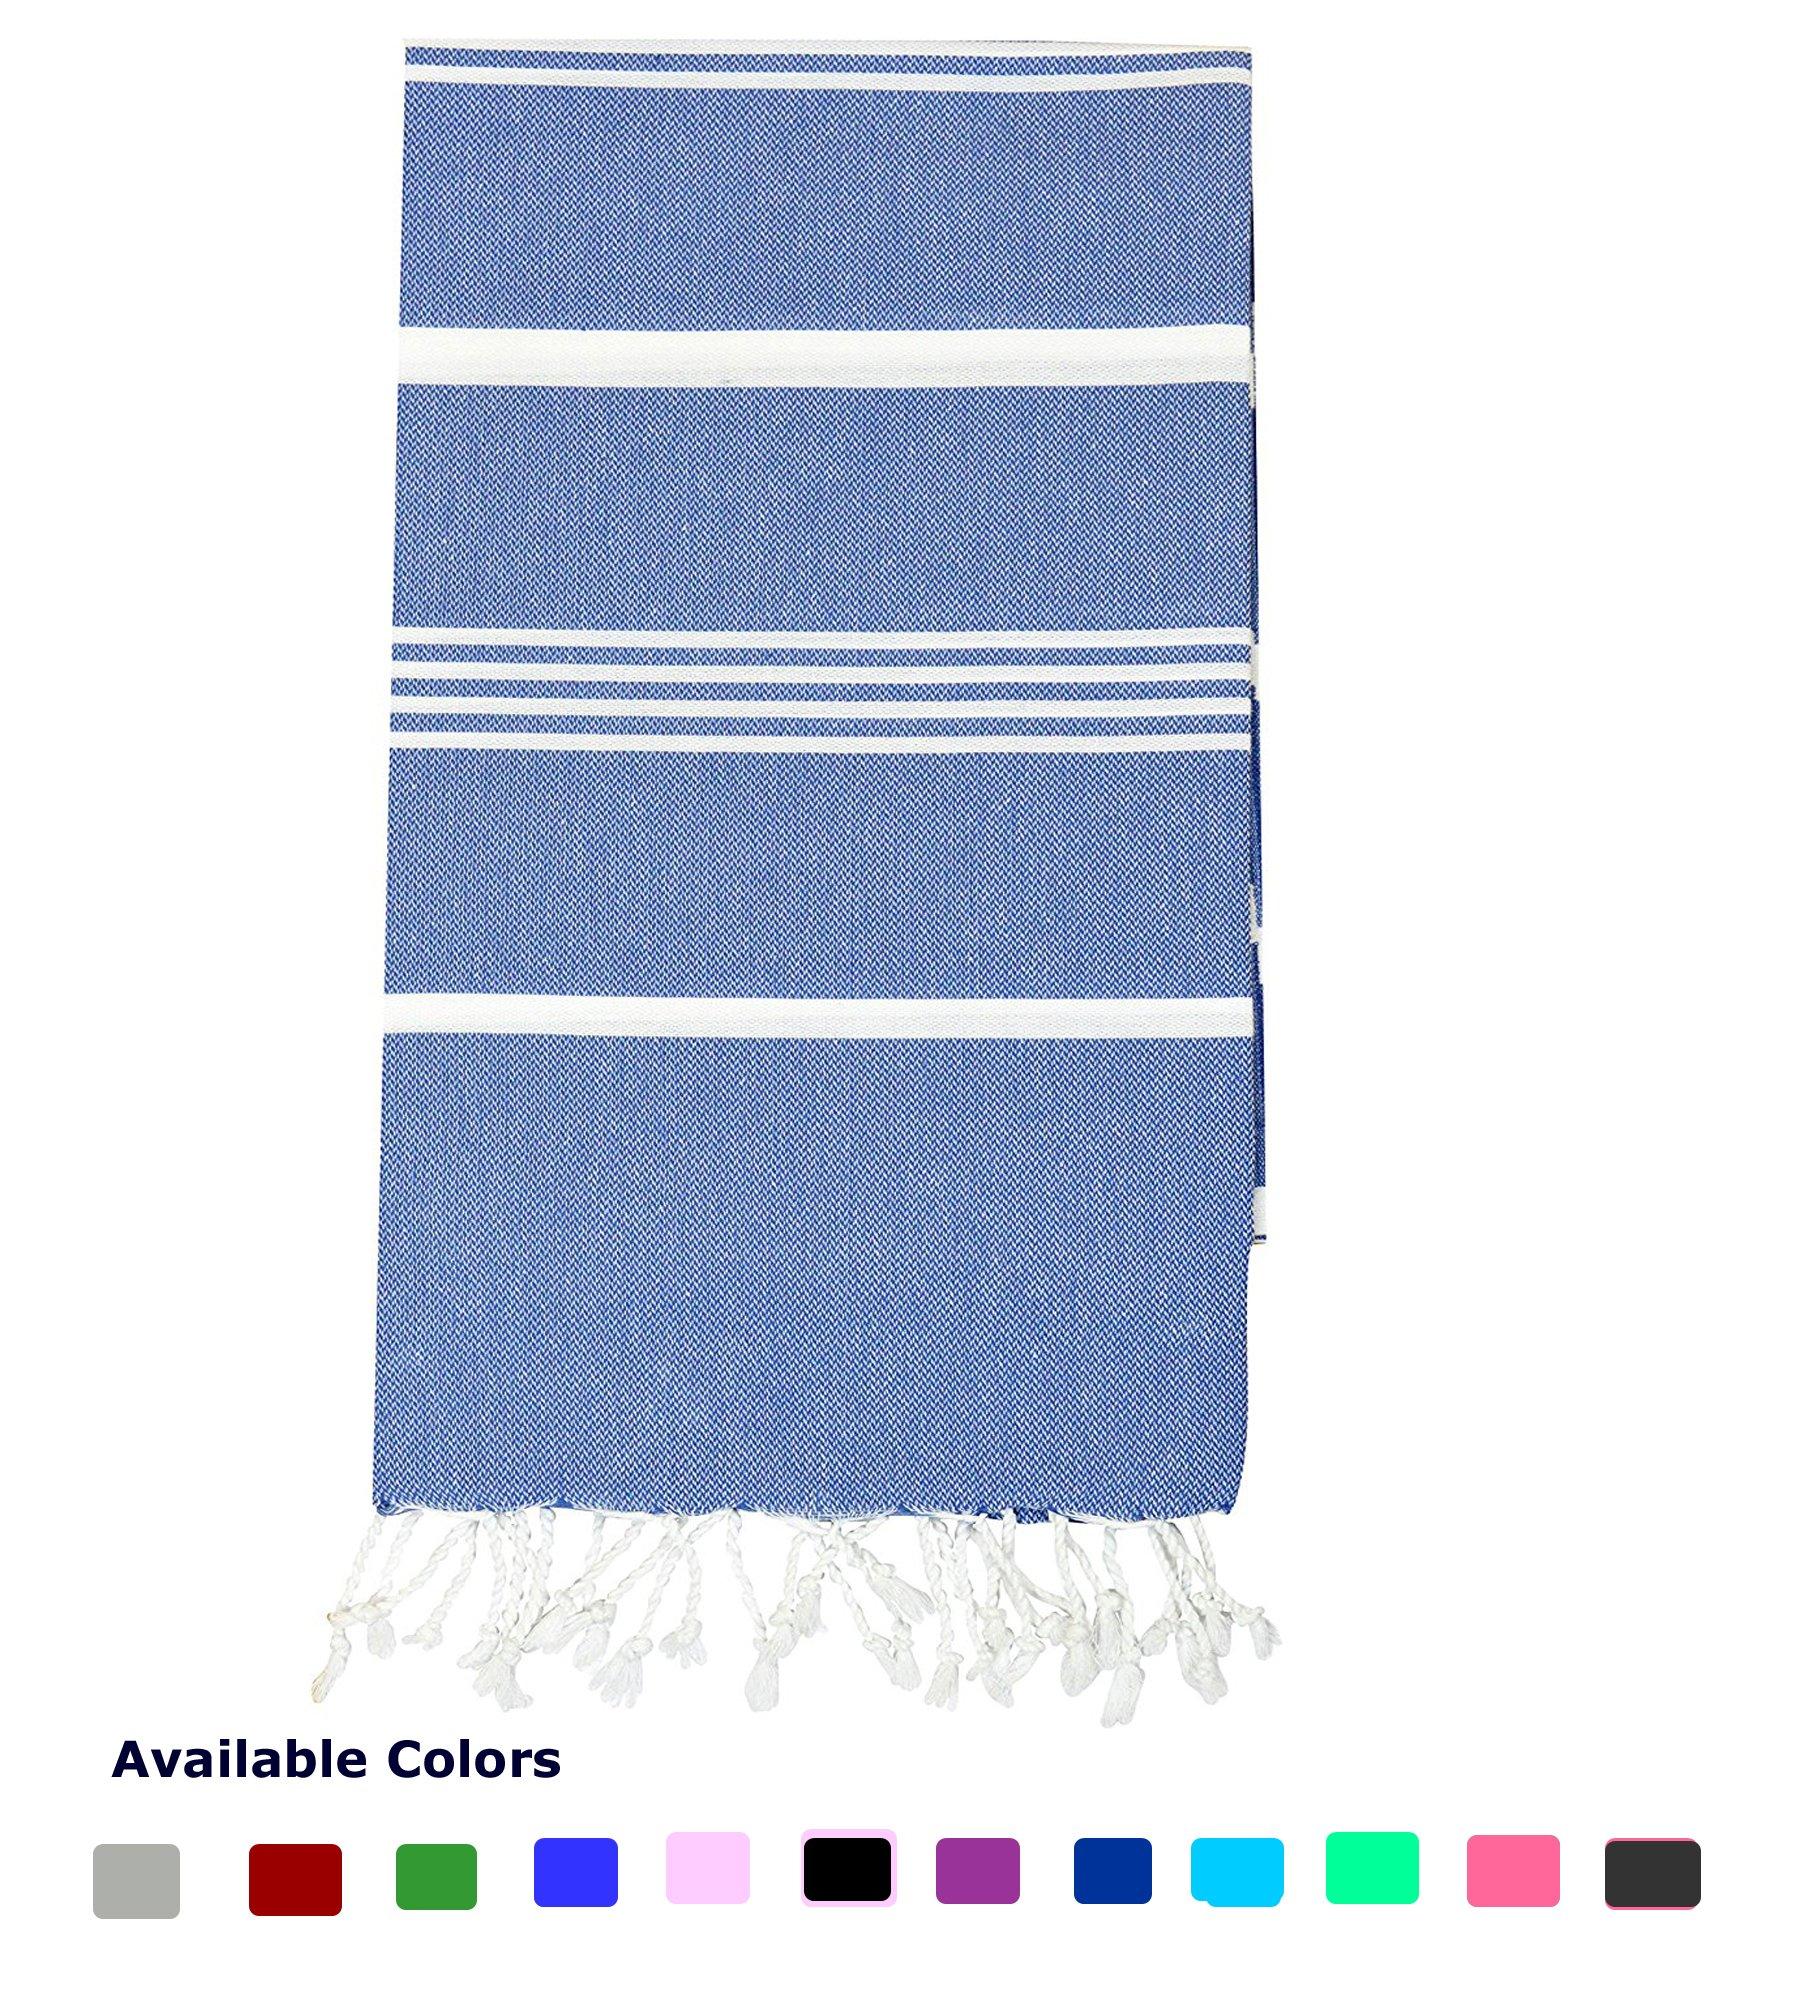 Nature Is Gift Turkish Peshtemal Towels Pestemal Towel Thin Camping Bath Sauna Beach Gym Pool Blanket Fouta Towels 100% Cotton Denim Blue